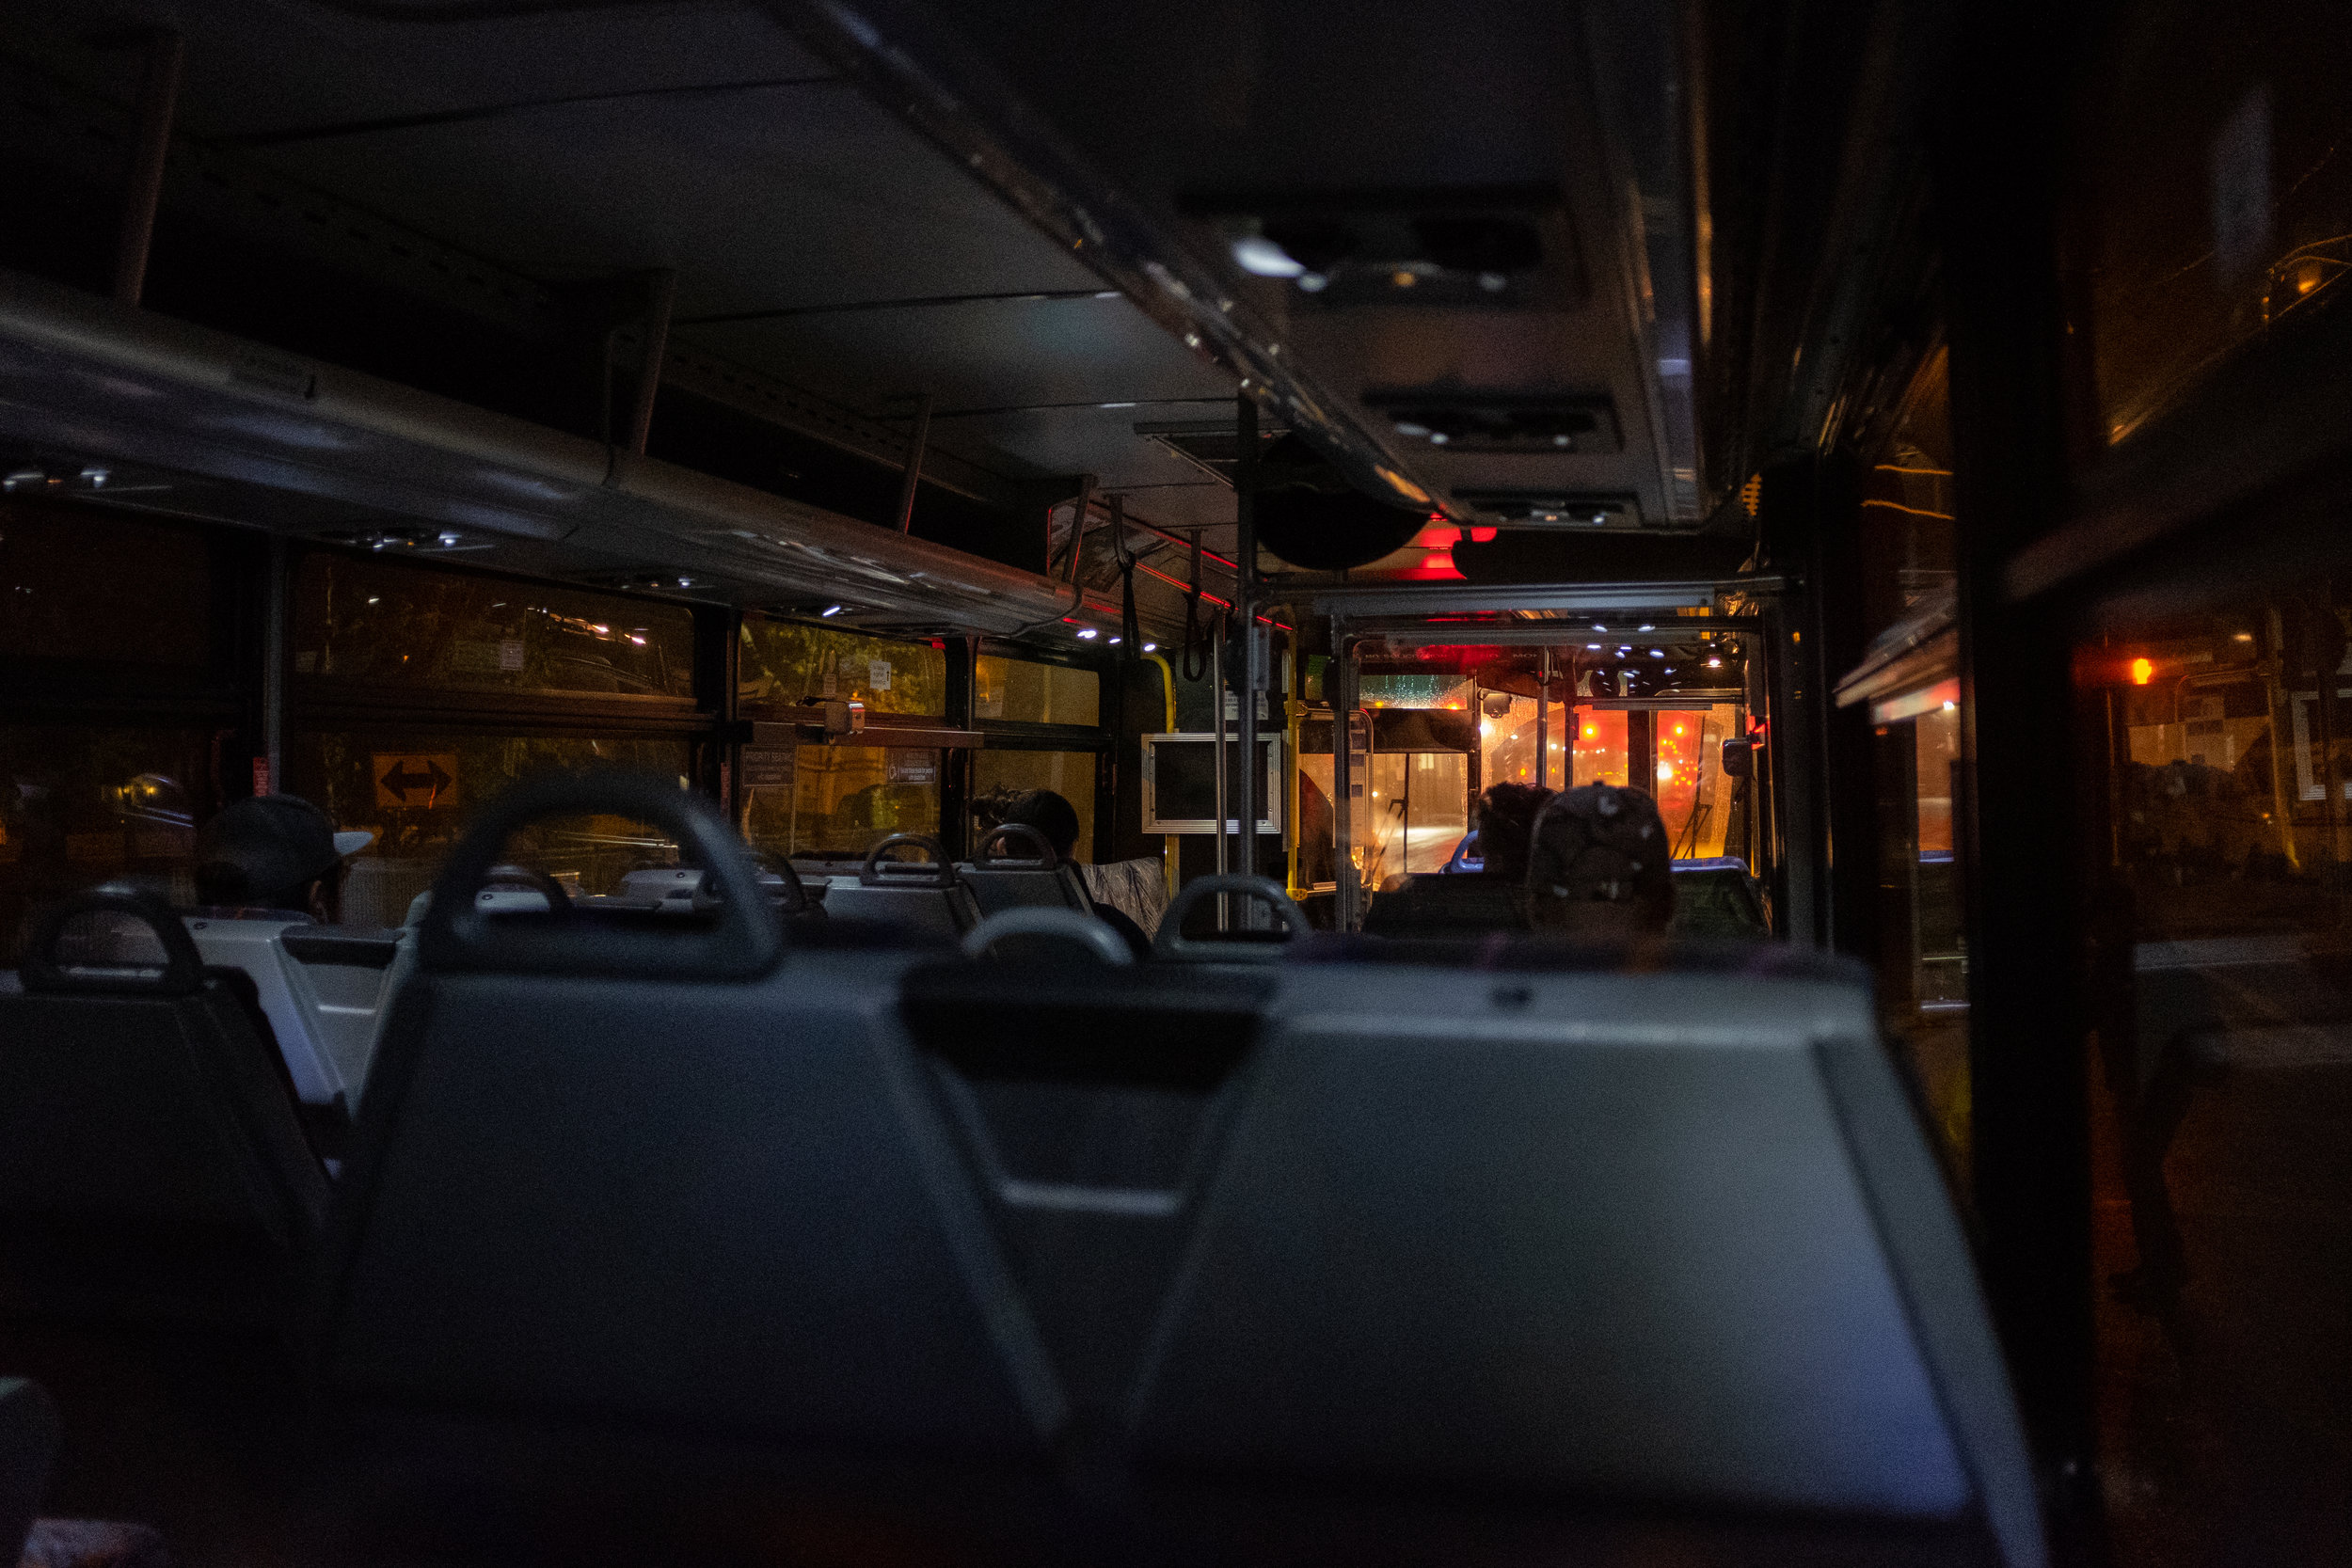 I imagine this bus is my spaceship